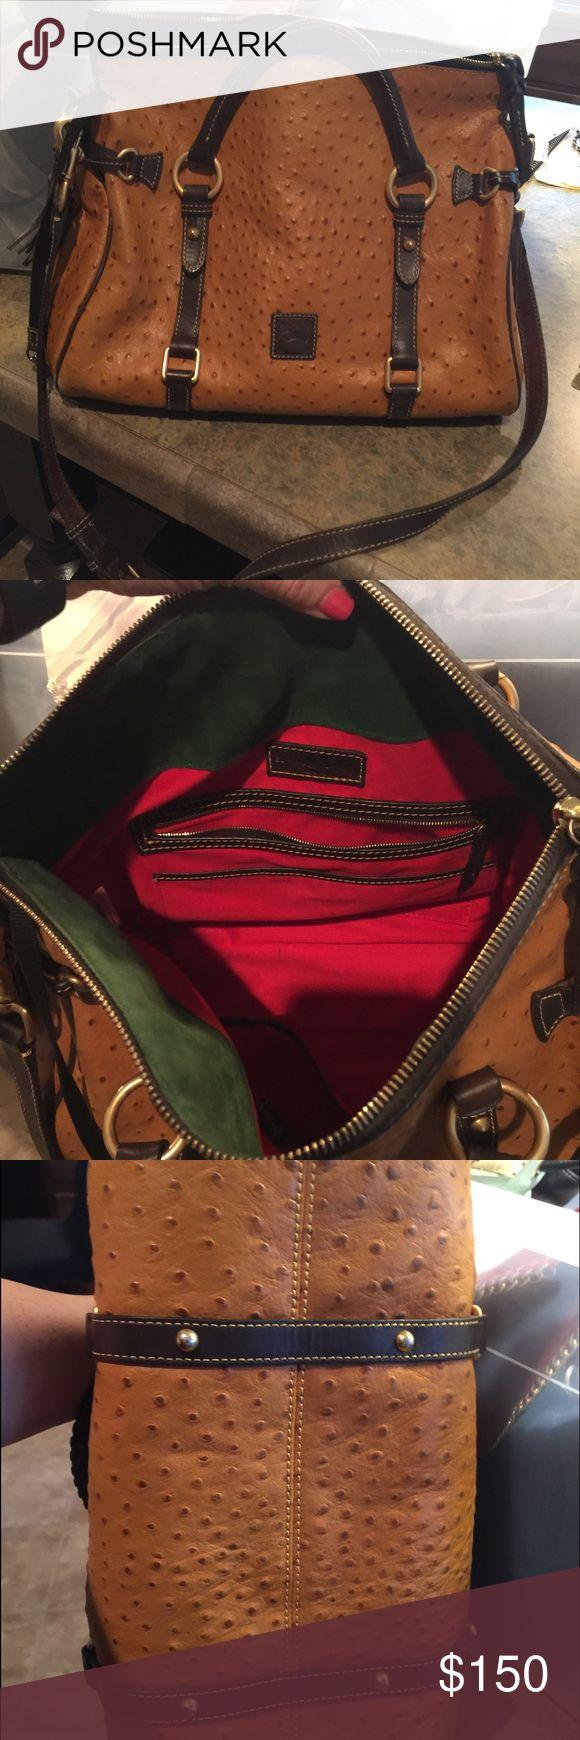 Dooney & Bourke large ostrich handbag Gorgeous bag. Excellent condition Dooney & Bourke Bags Crossbody Bags